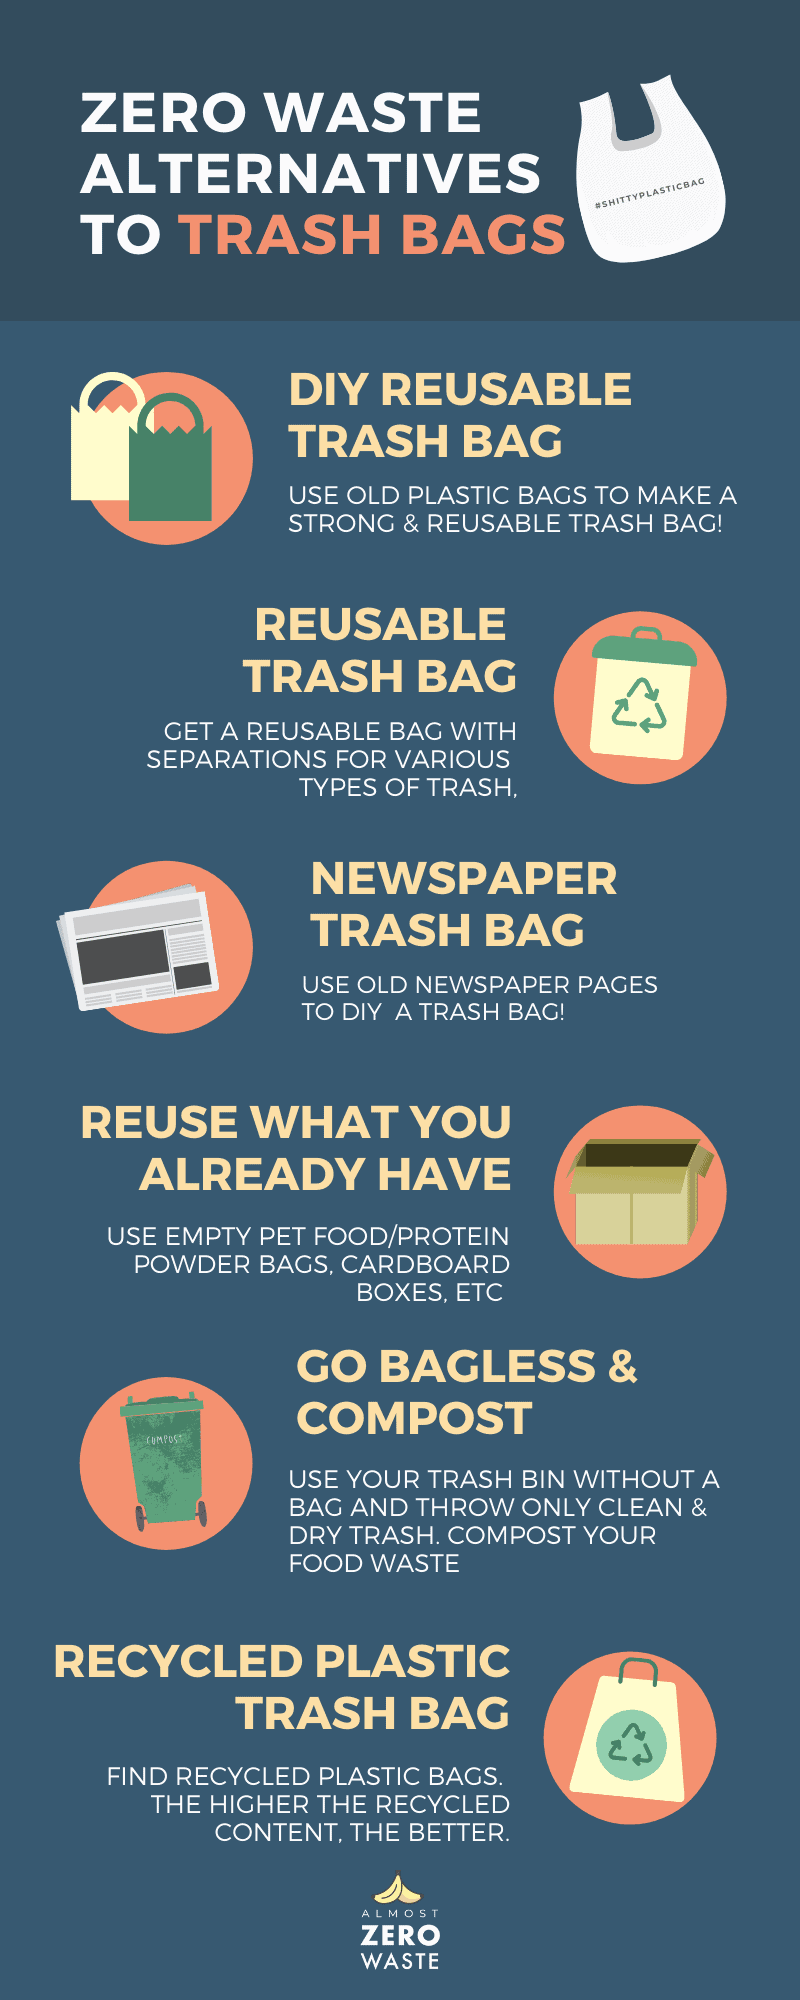 6 Zero Waste Alternatives To Trash Bags ( Infographic ) - Almost Zero Waste